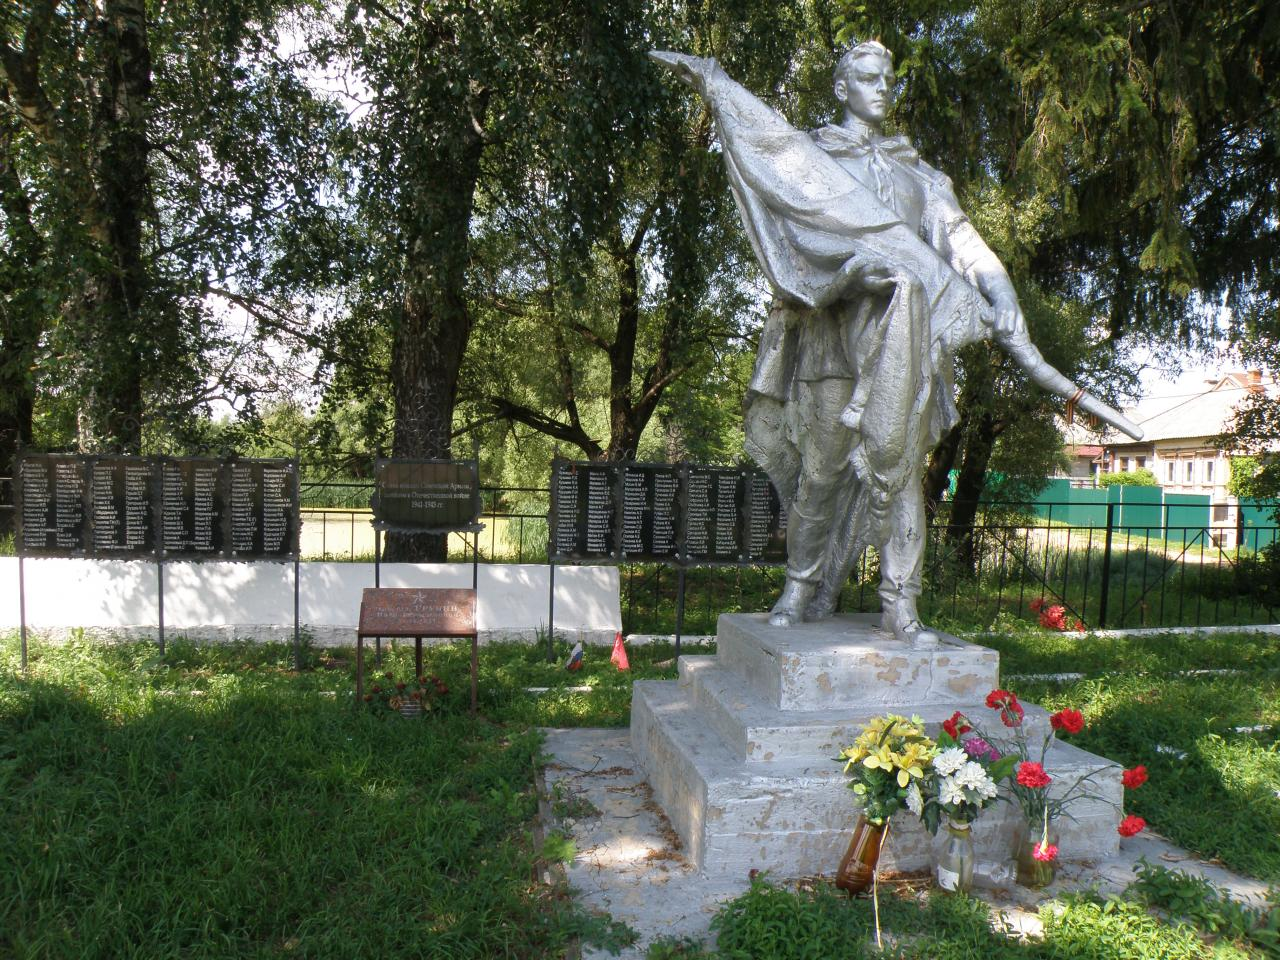 http://photos.wikimapia.org/p/00/04/98/75/75_1280.jpg